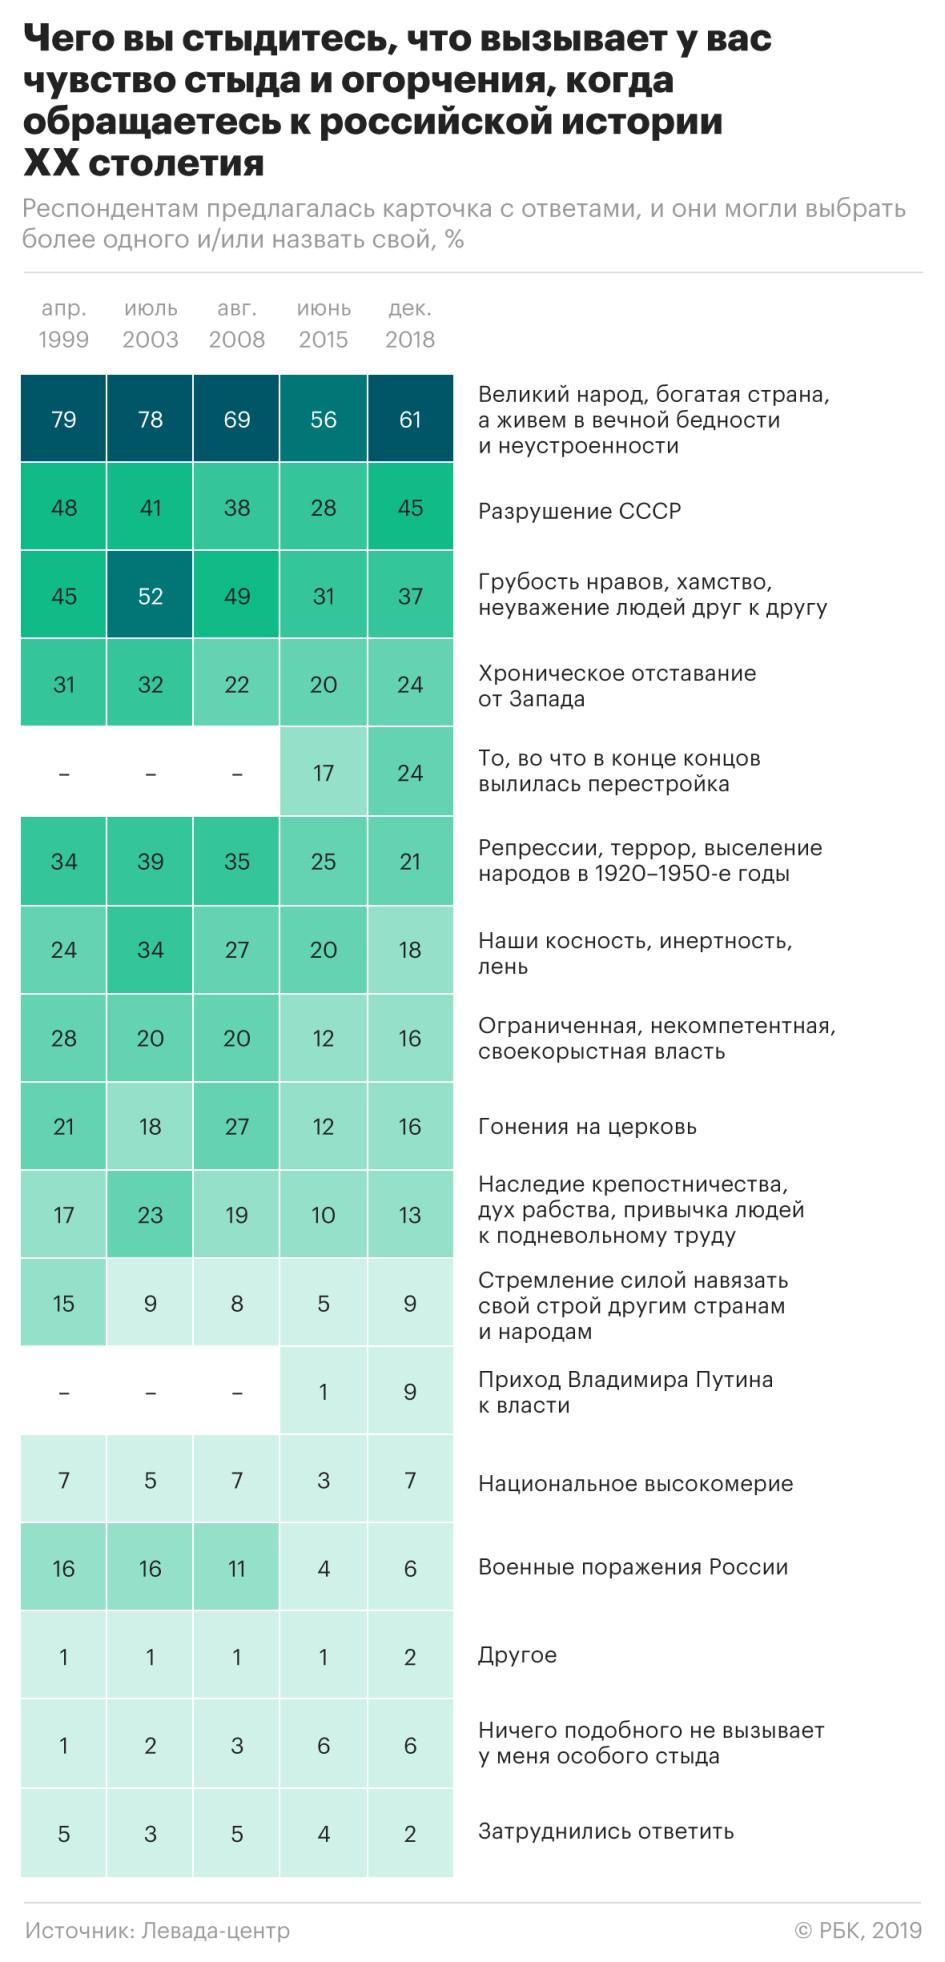 https://s0.rbk.ru/v6_top_pics/resized/945xH/media/img/9/24/755475673332249.jpeg